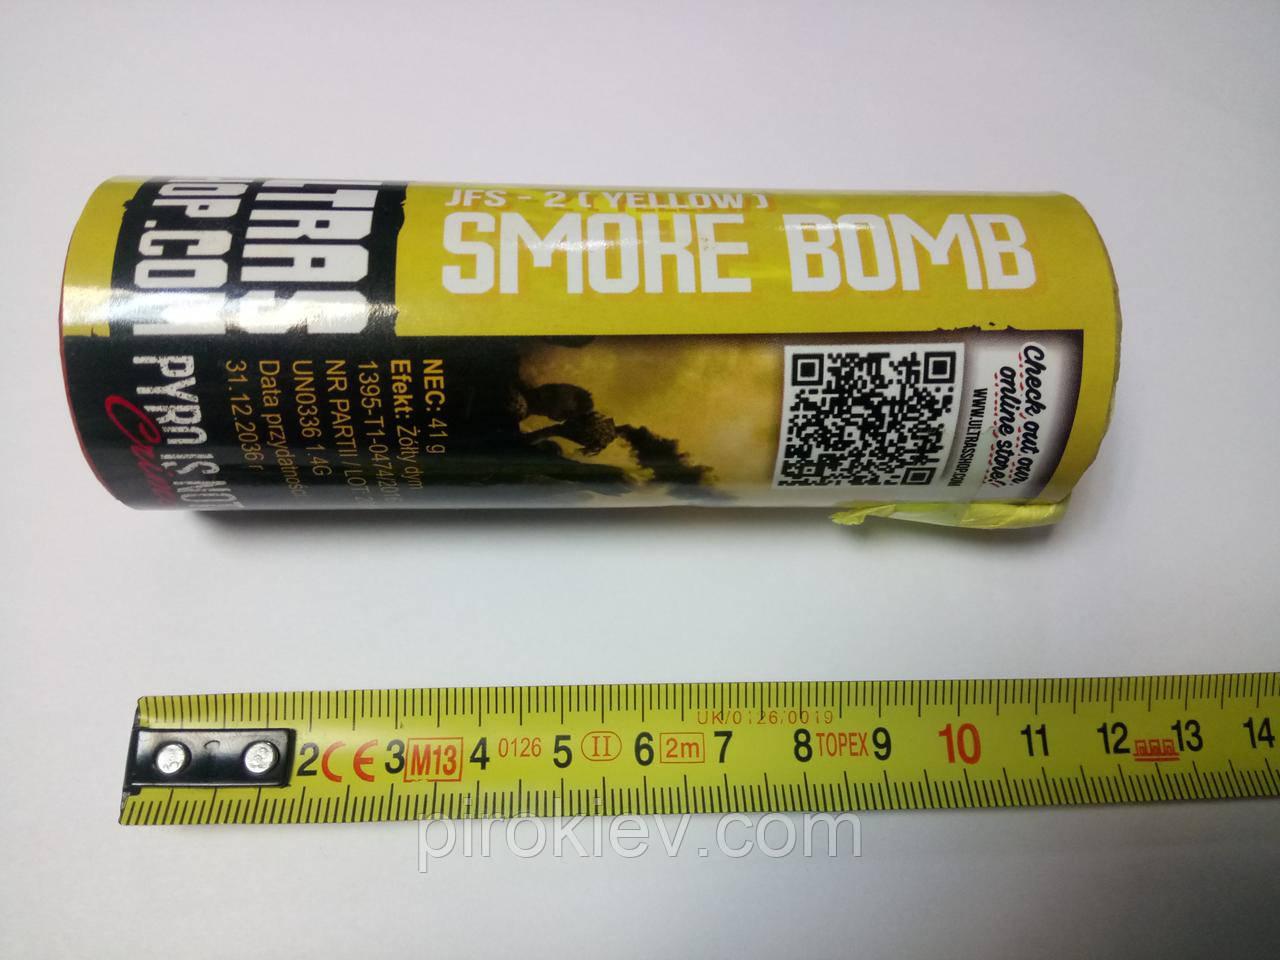 JFS-2 (Yellow) Smoke Bomb дымовая шашка желтого дыма